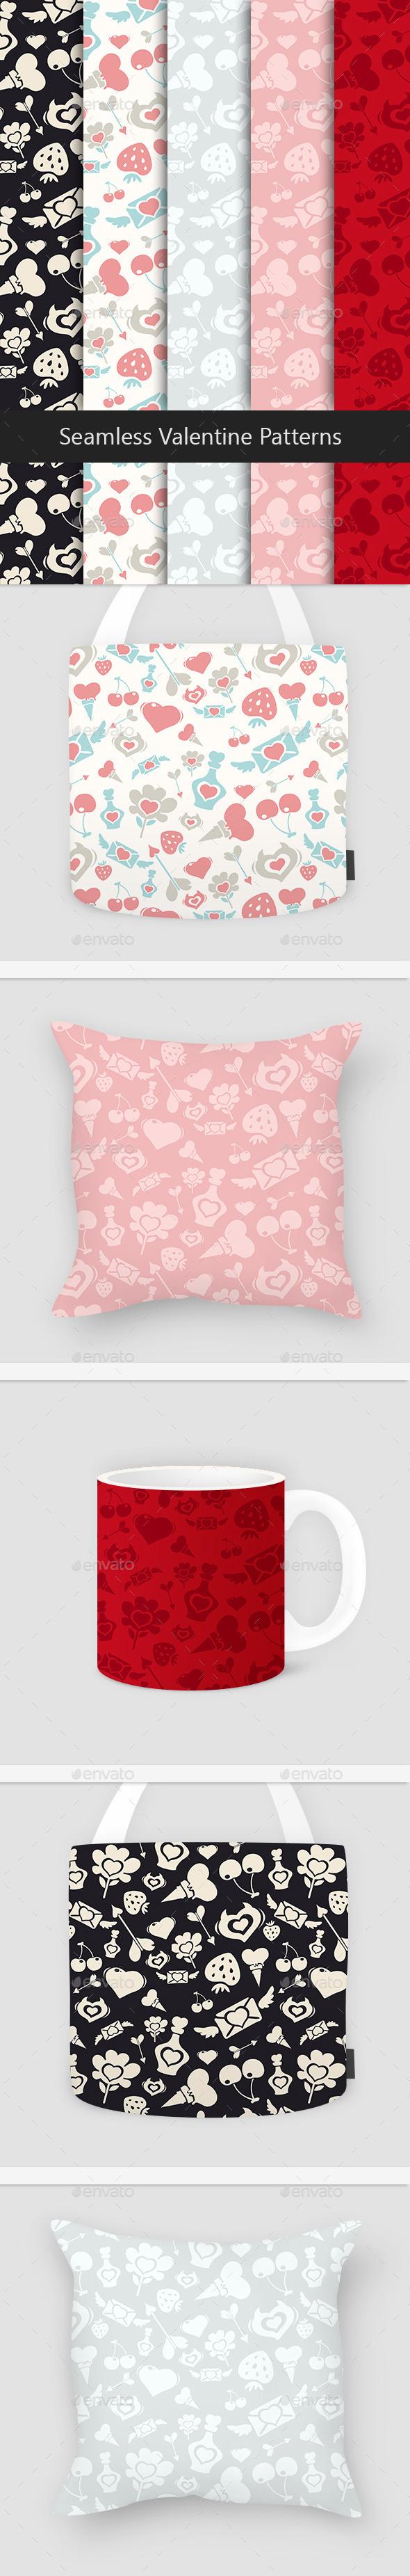 GraphicRiver Seamless Valentine Patterns Set 10338940